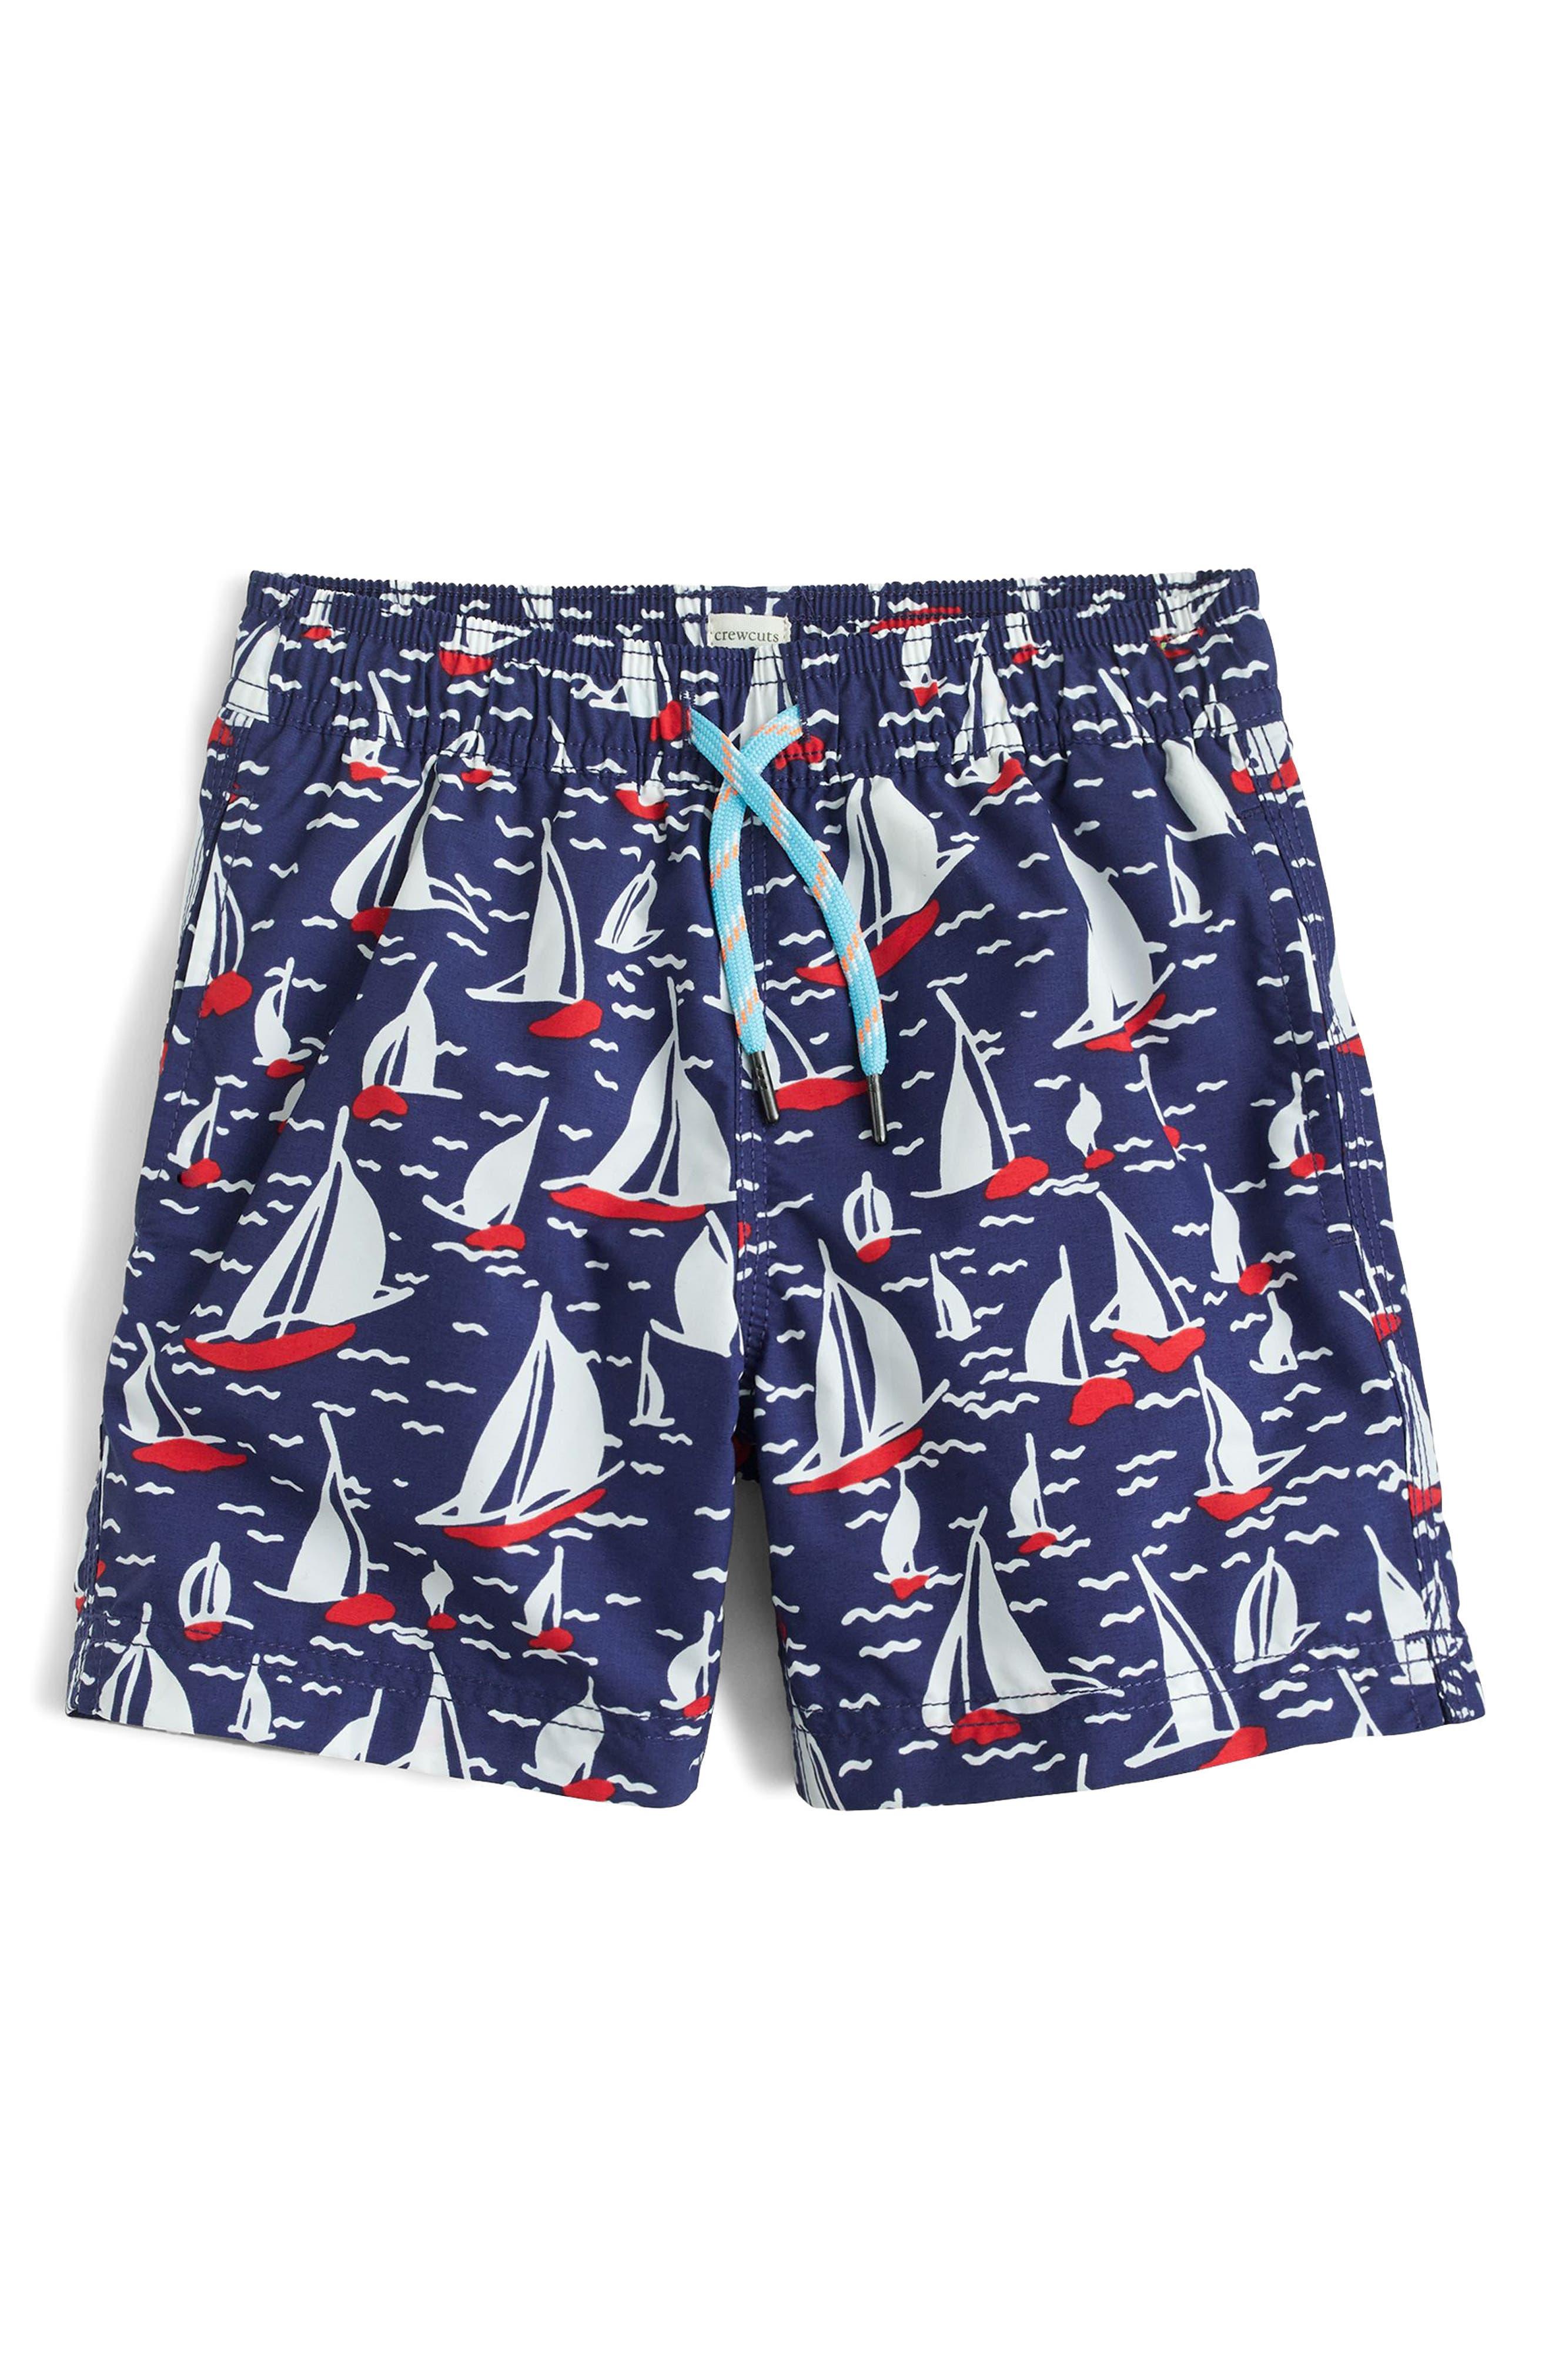 Sailboat Swim Trunks,                             Main thumbnail 1, color,                             Navy Seas